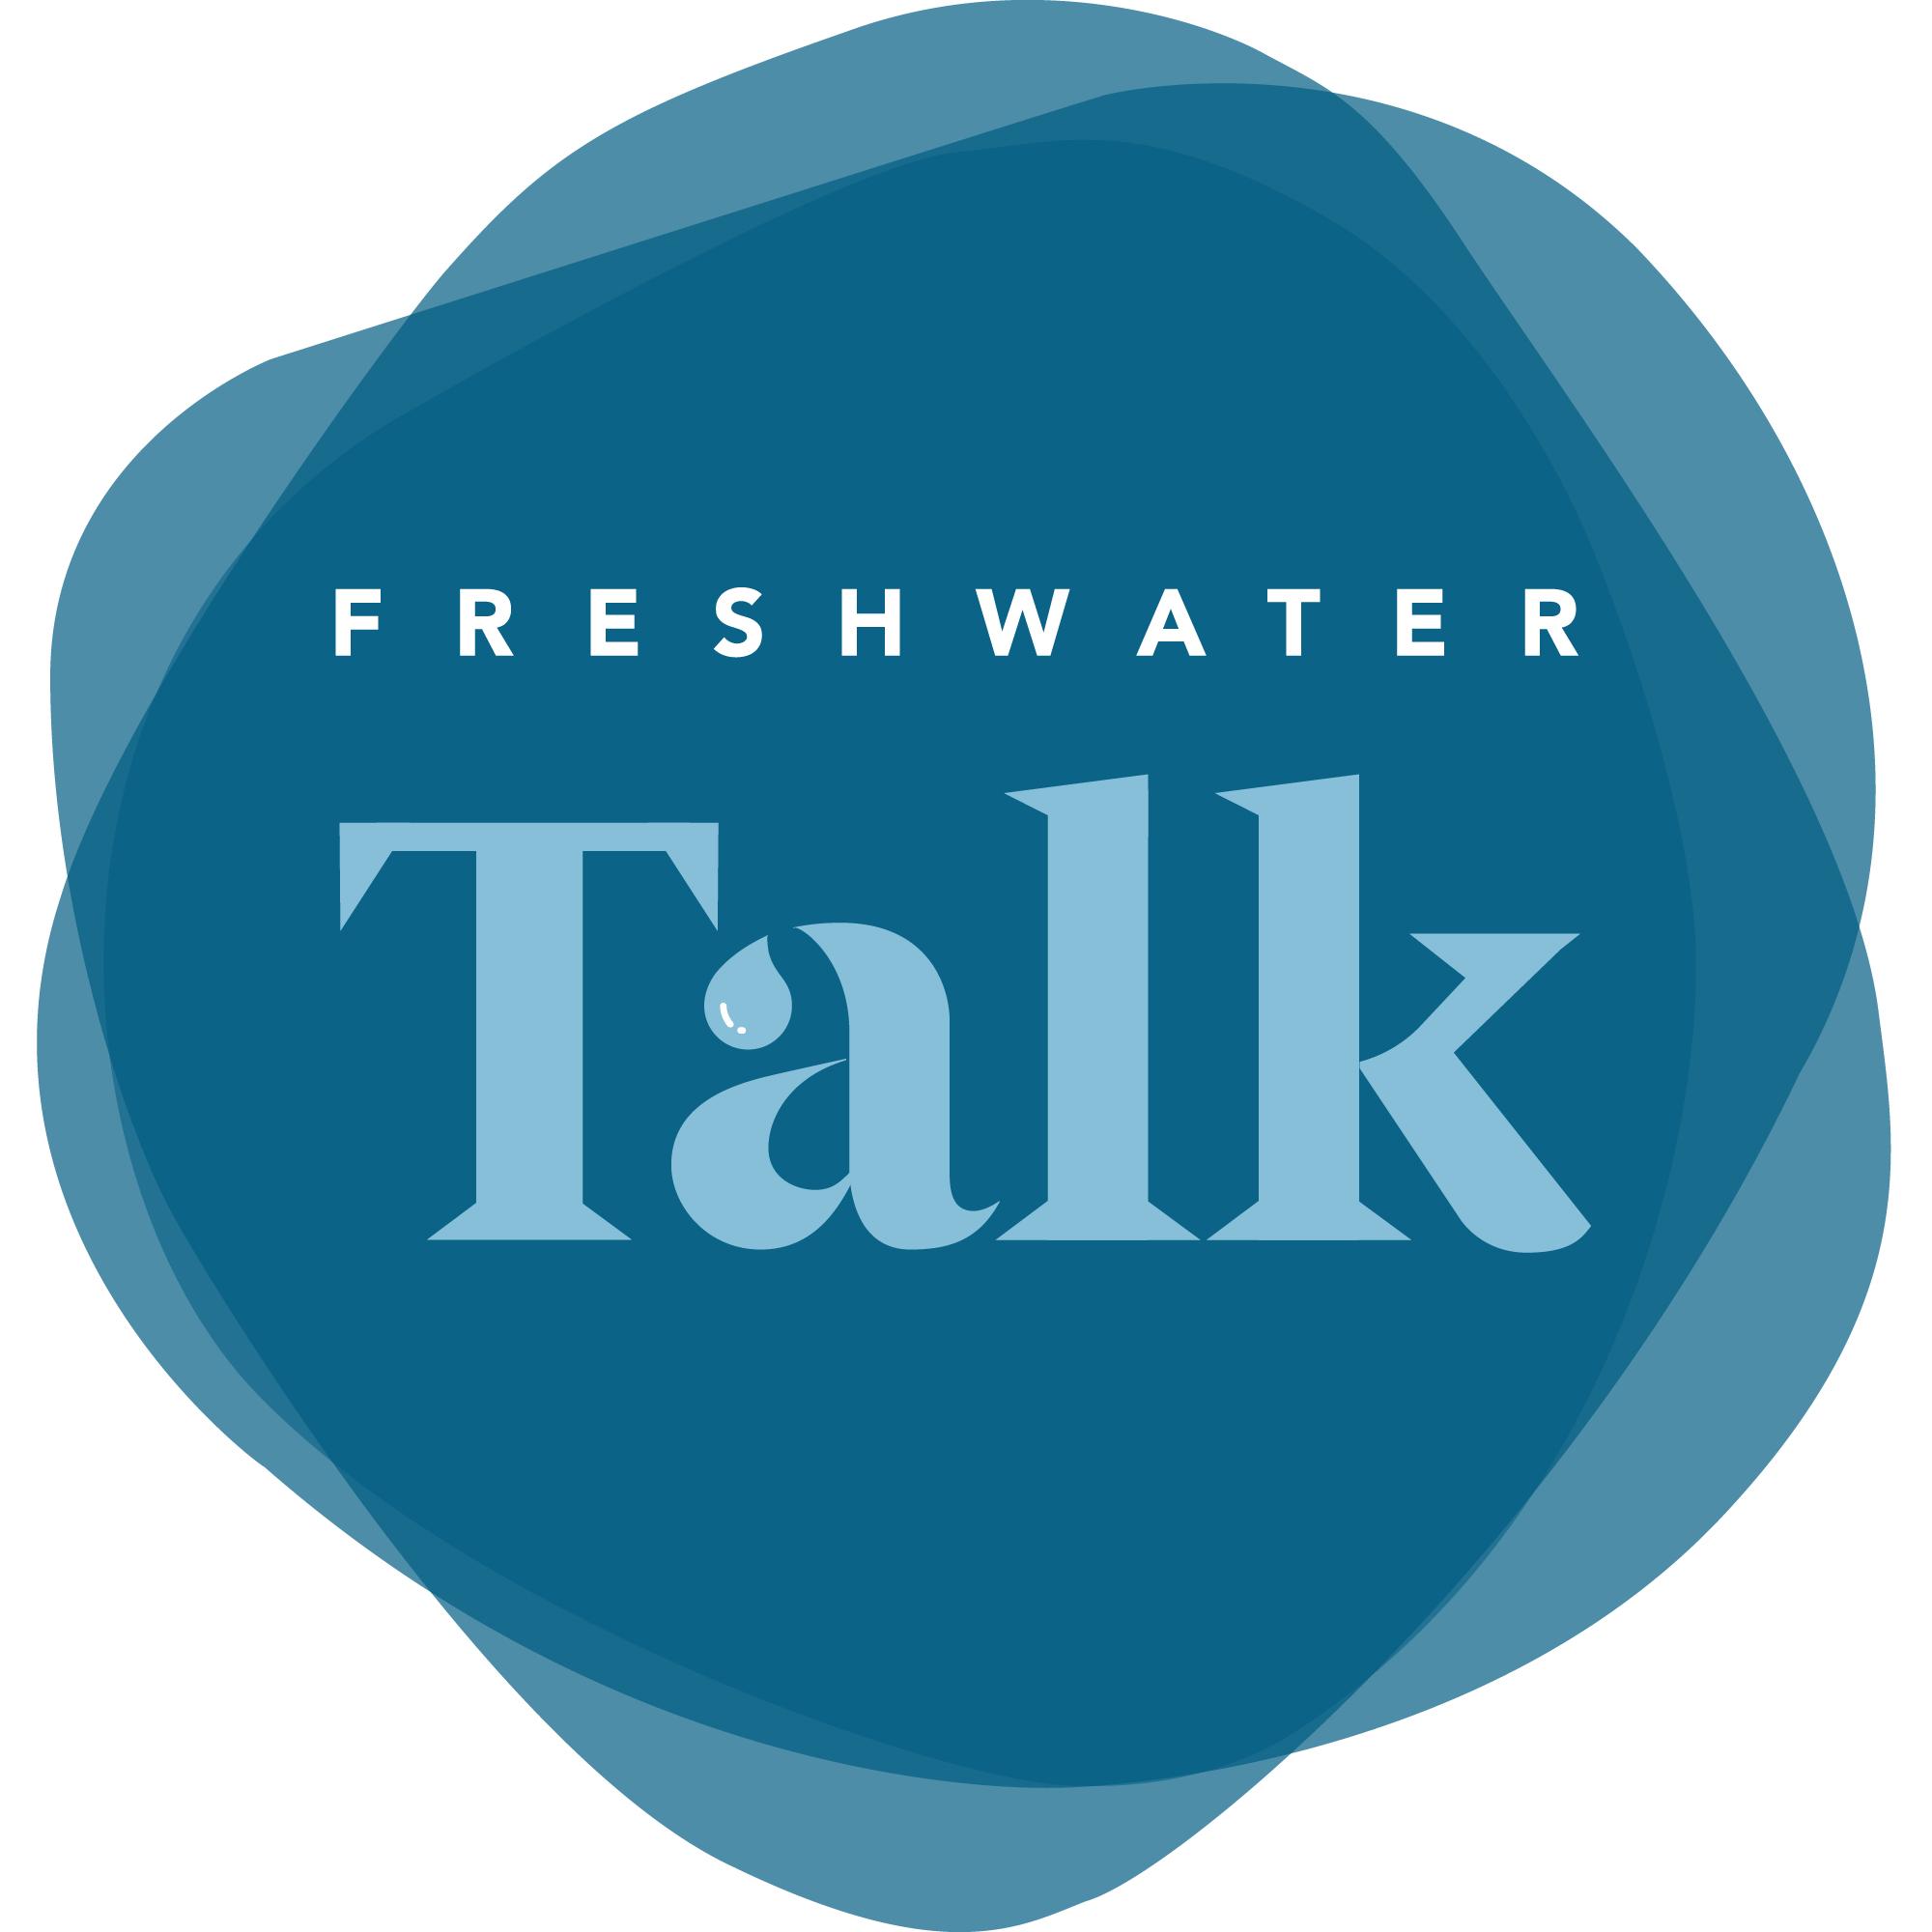 Freshwater Talk